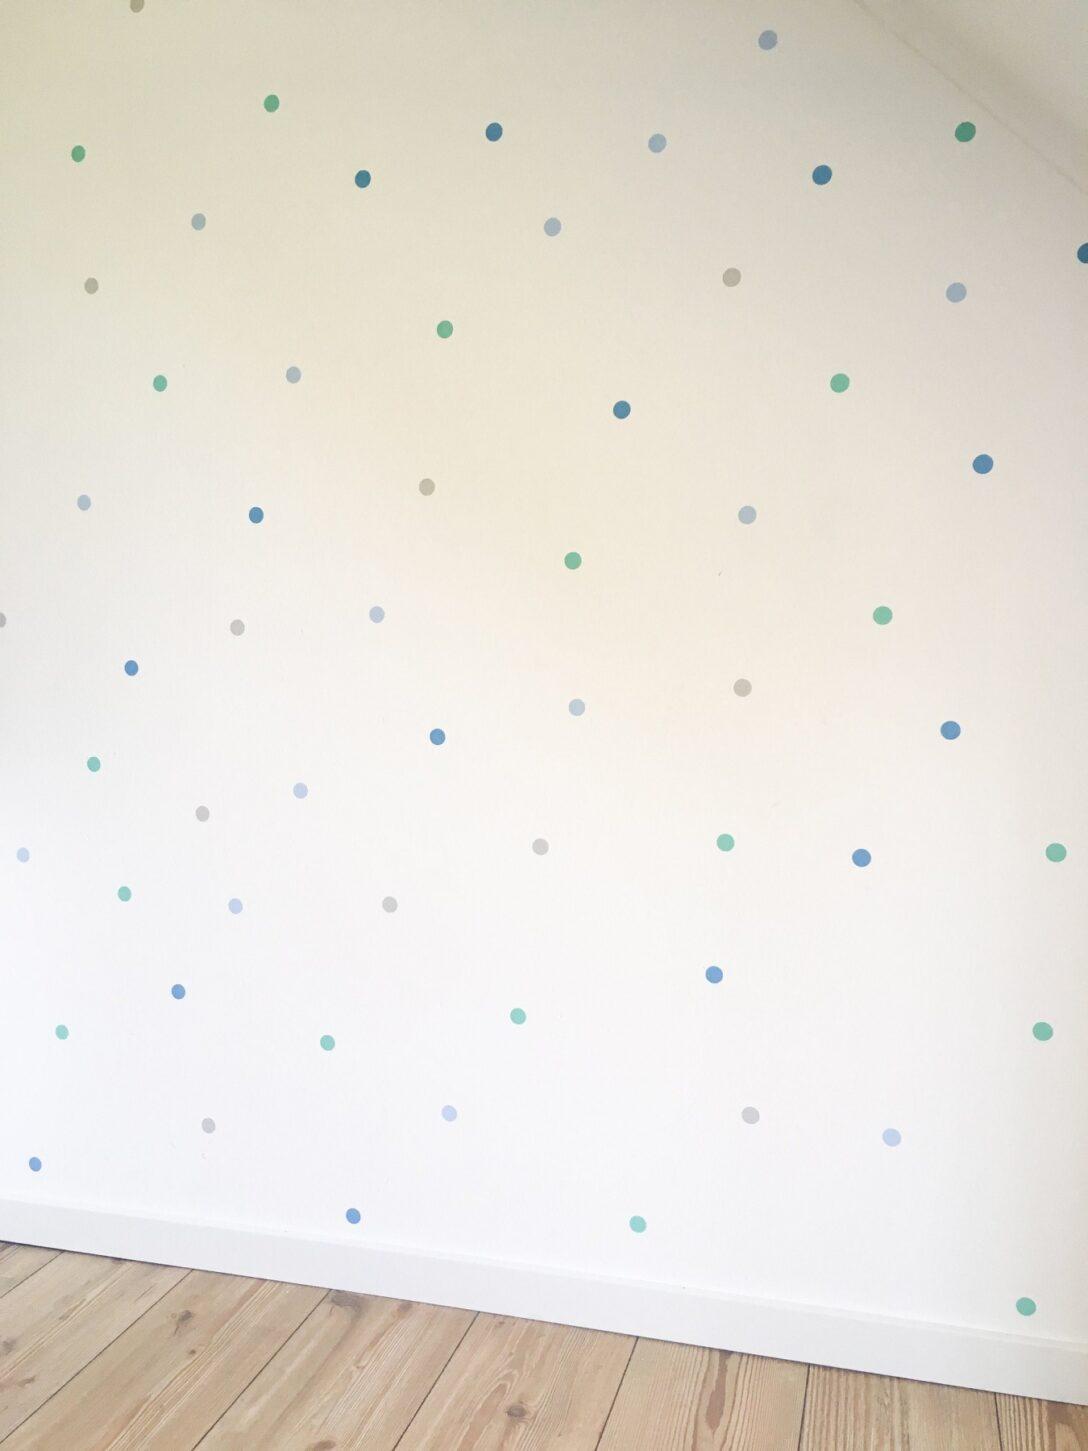 Large Size of Wandaufkleber Kinderzimmer Wanddekoration Wandtattoo Punkte Regale Sofa Regal Weiß Kinderzimmer Wandaufkleber Kinderzimmer